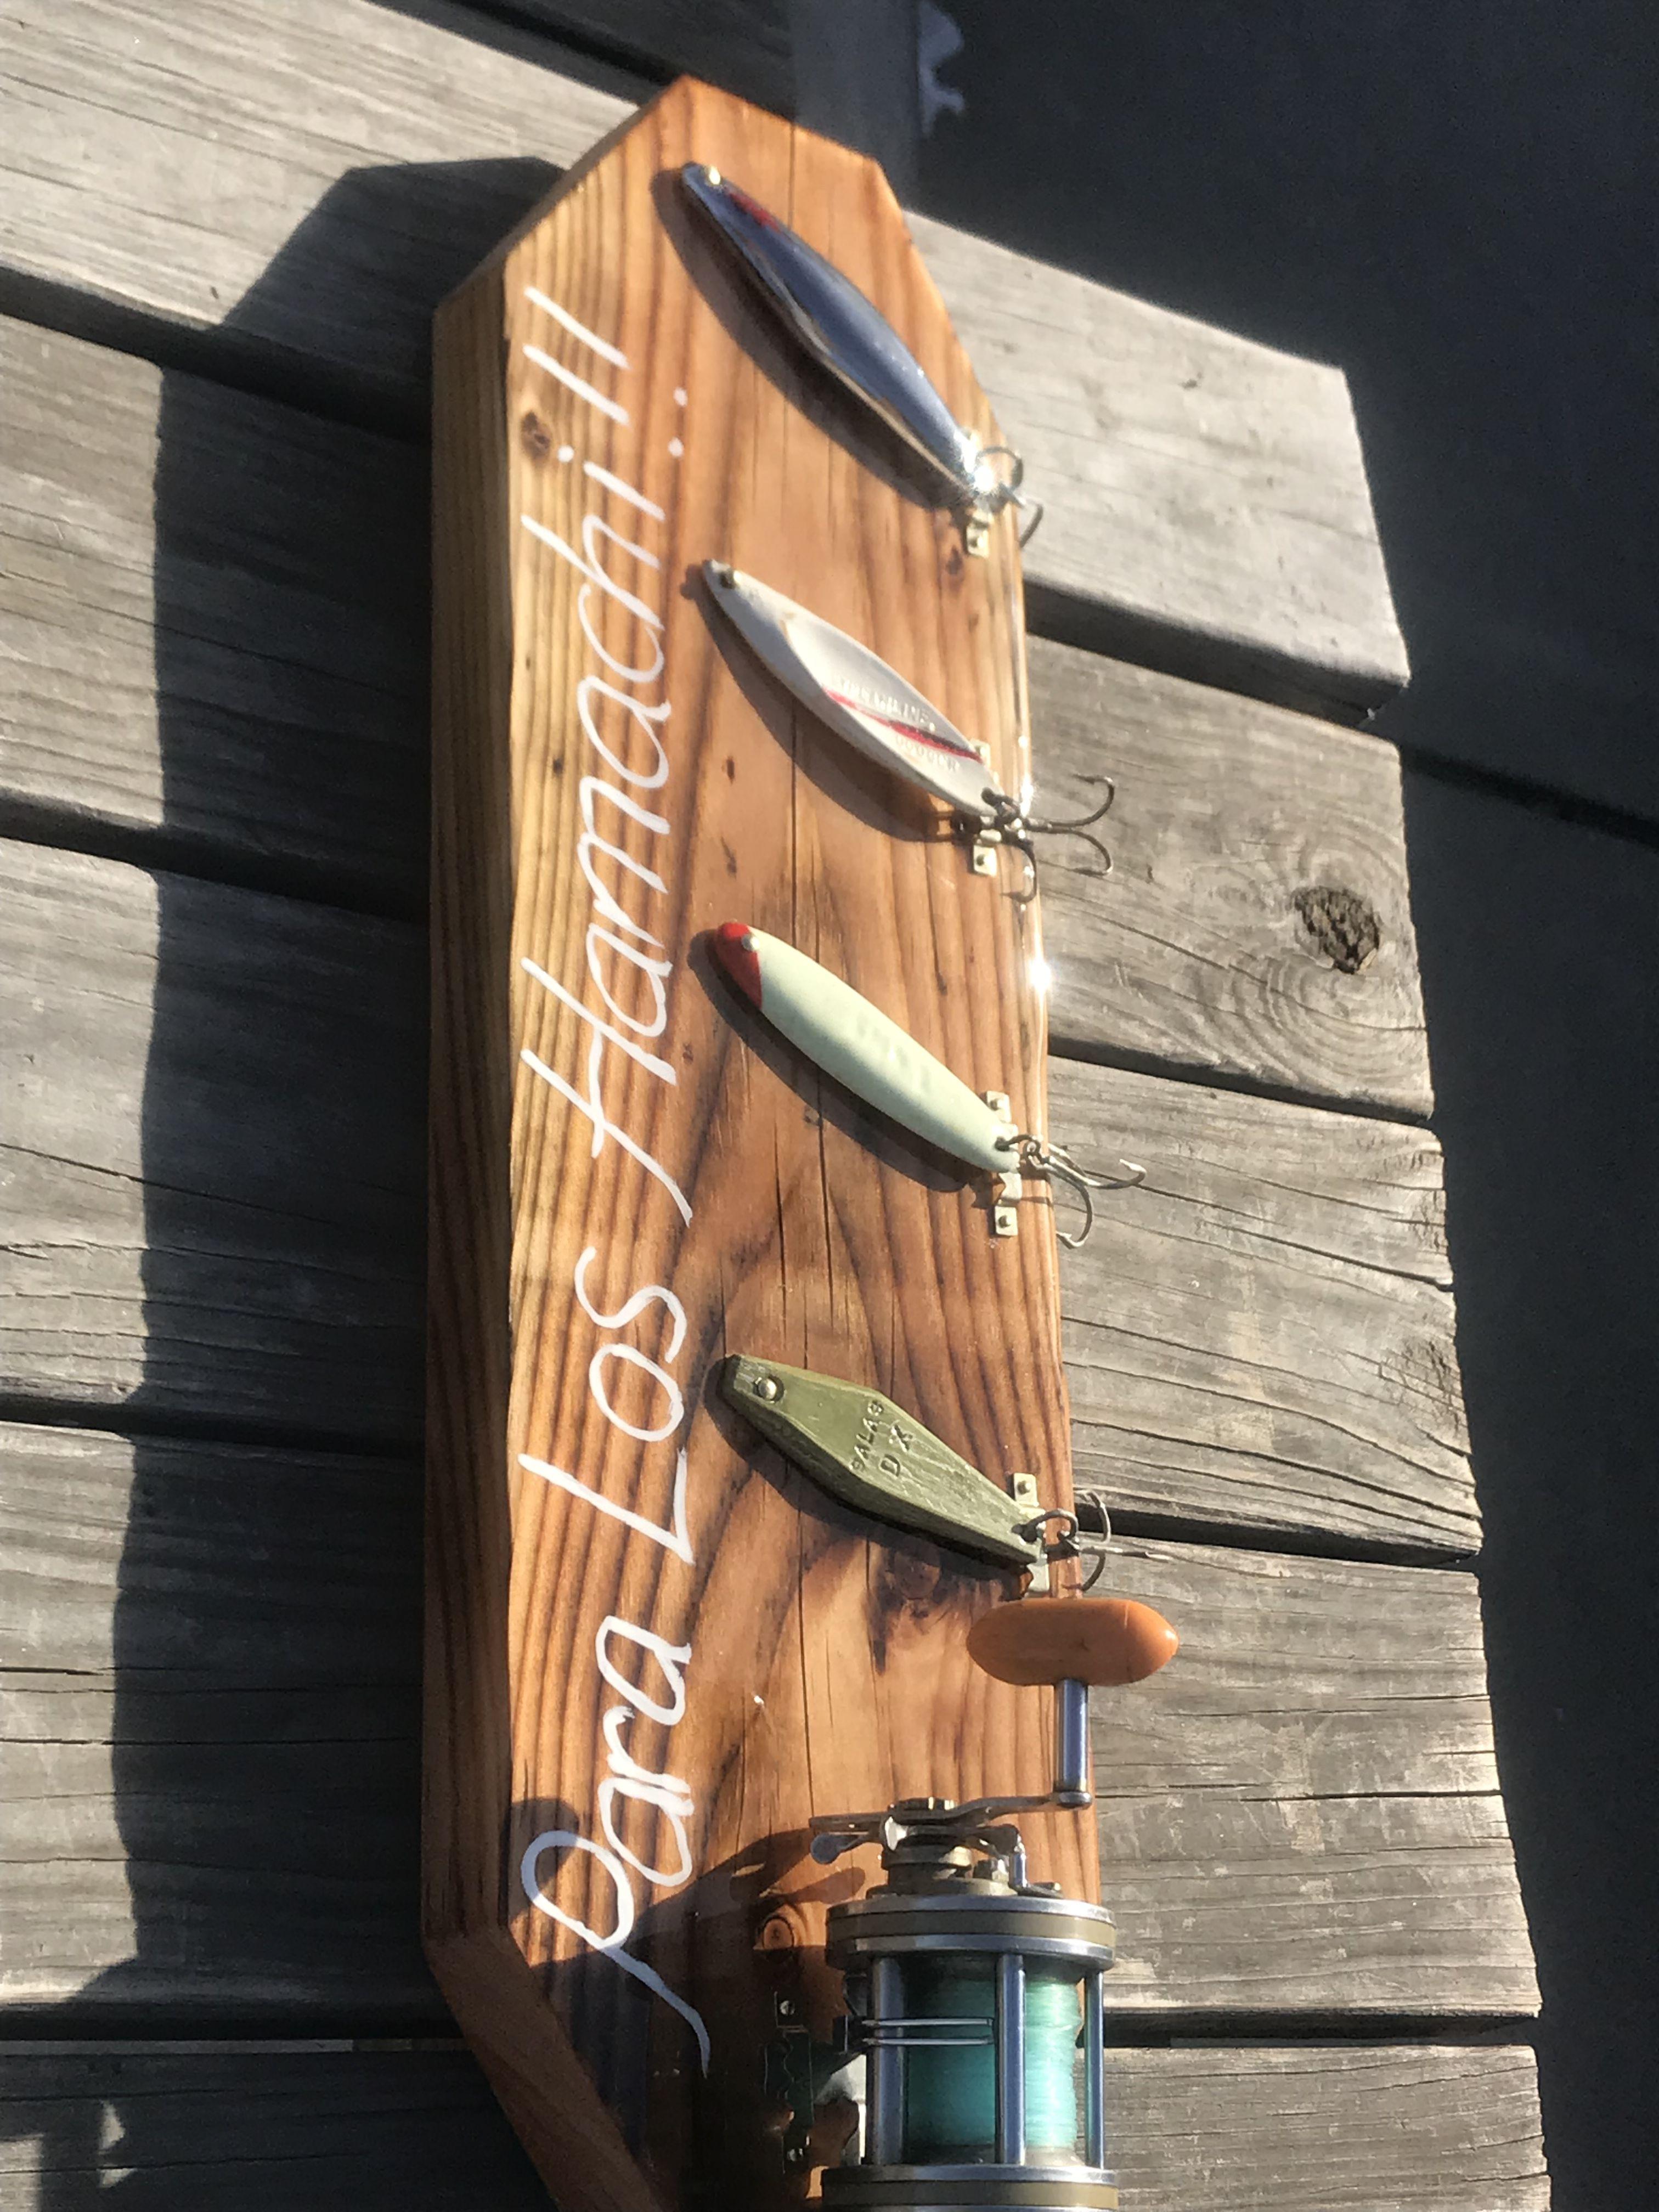 Pin by angel cruz on diy wood wood diy butcher block wood